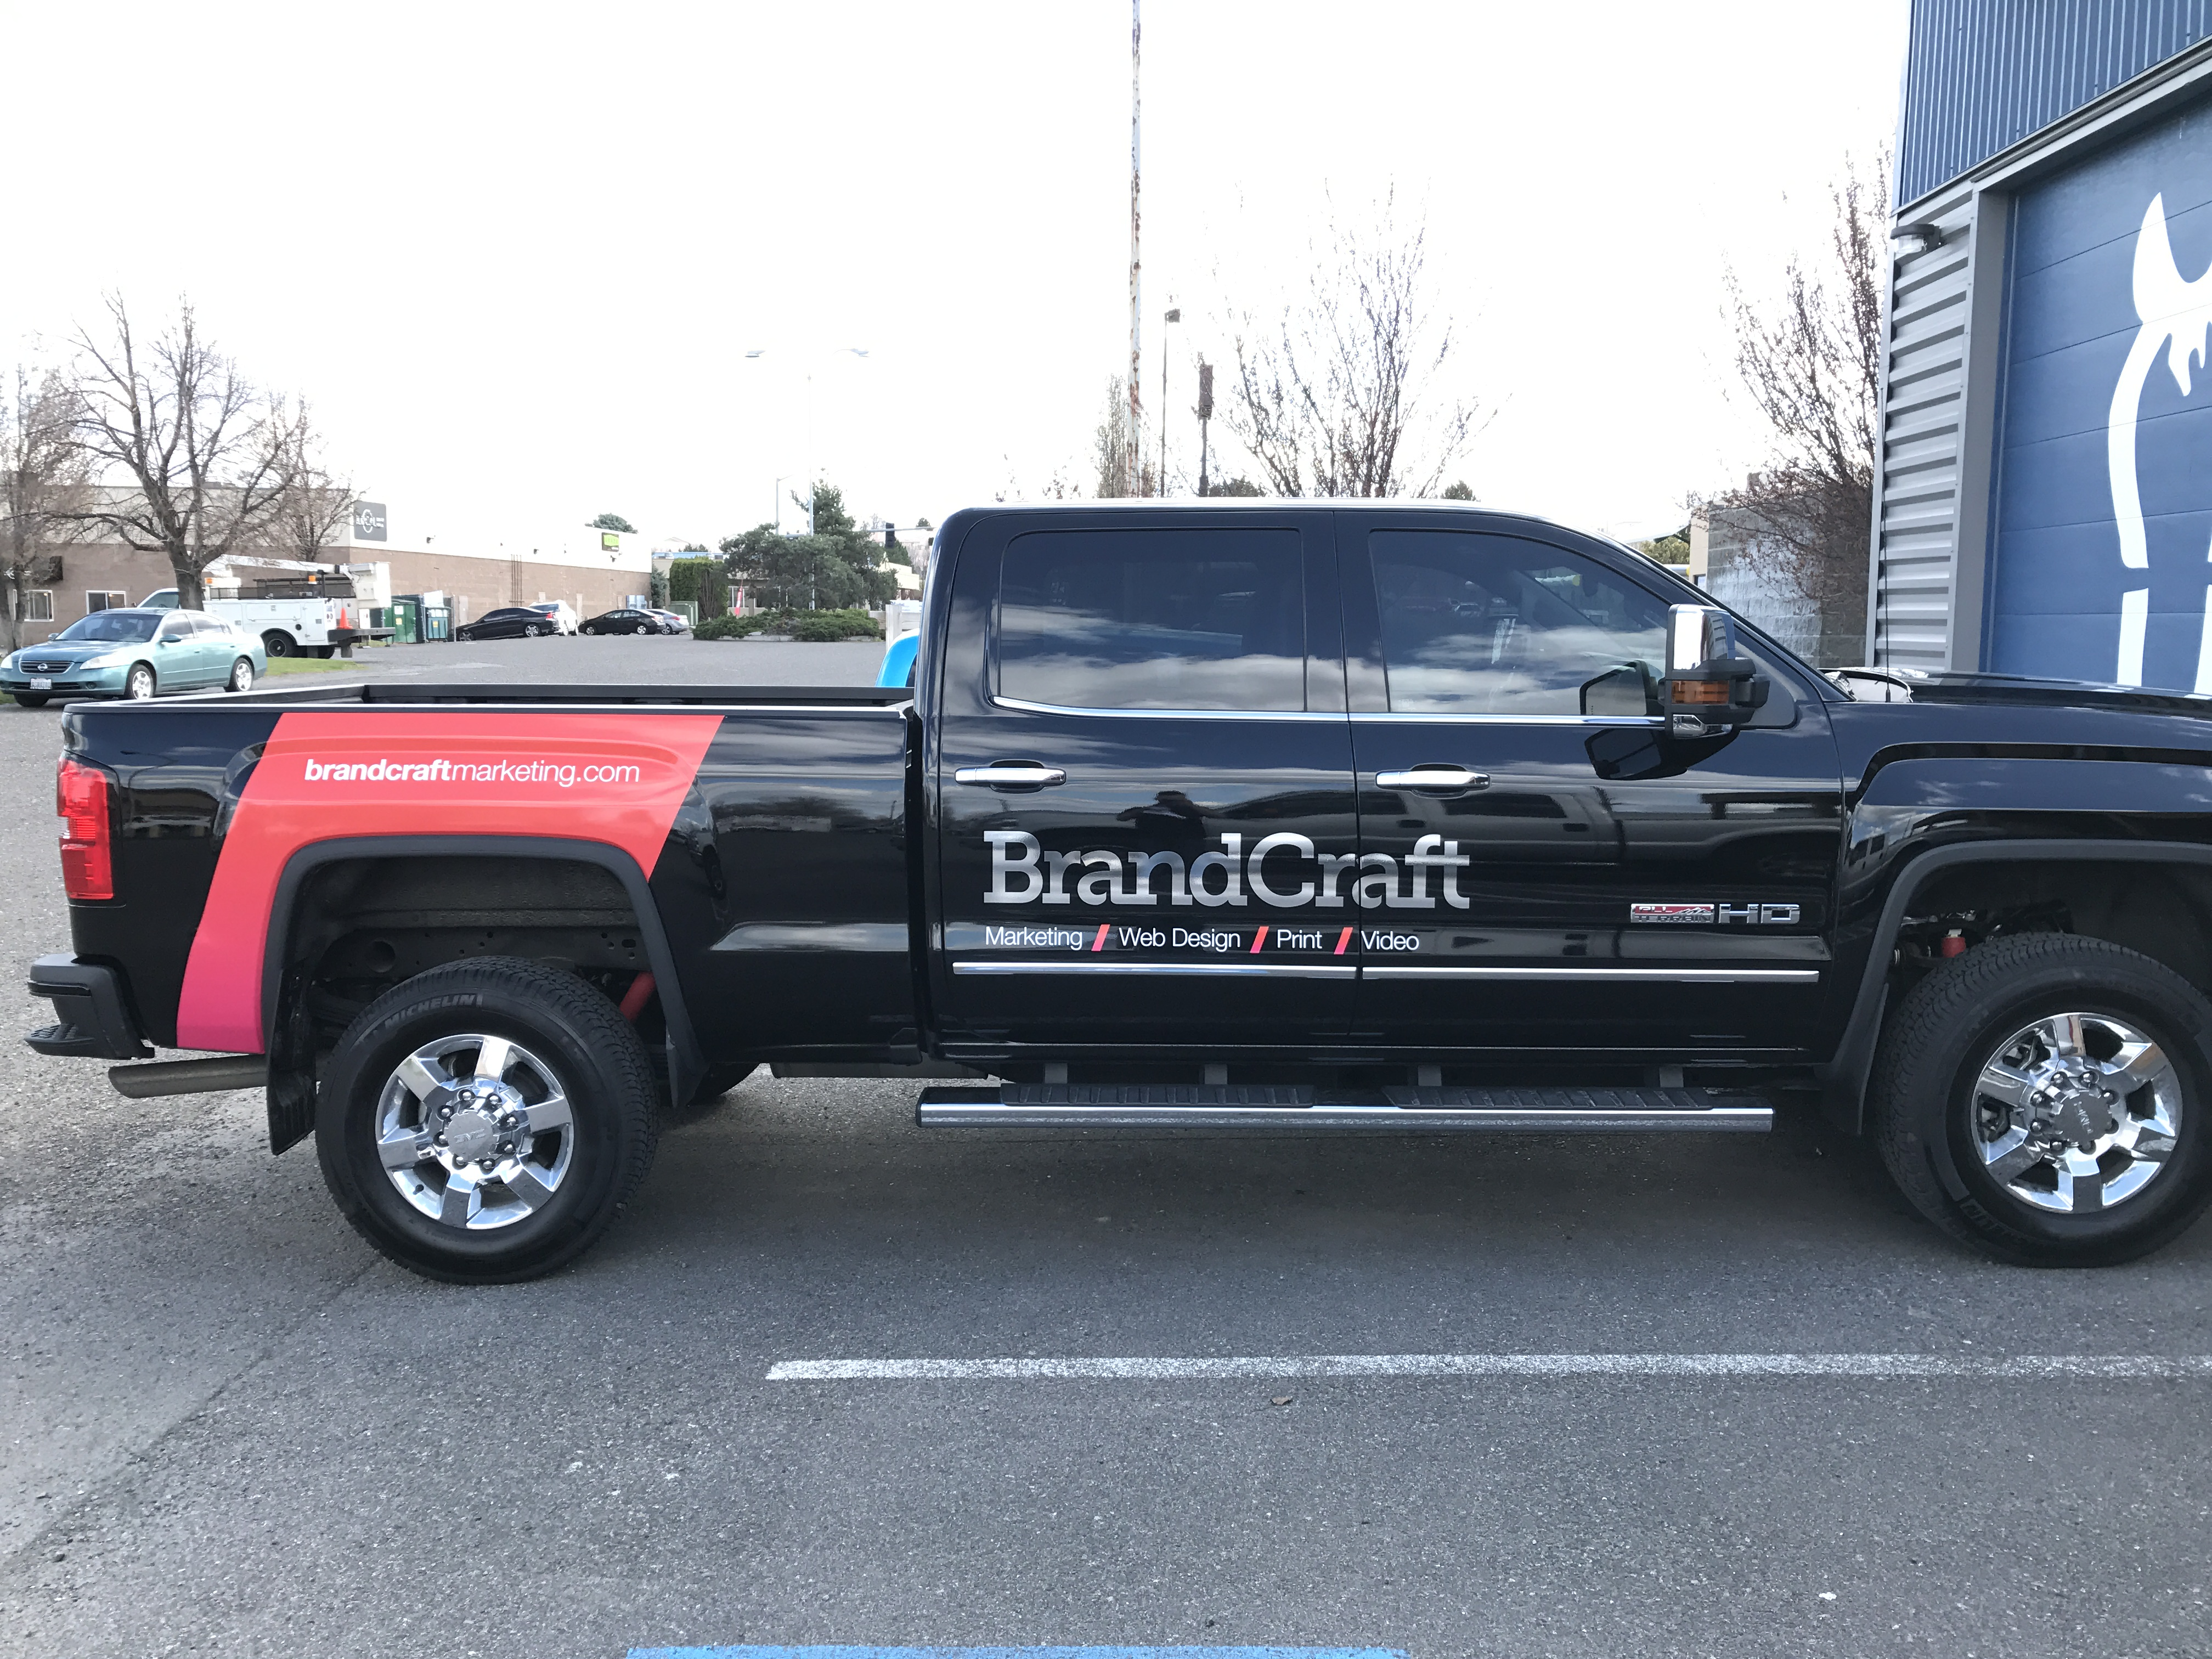 BrandCraft - truck